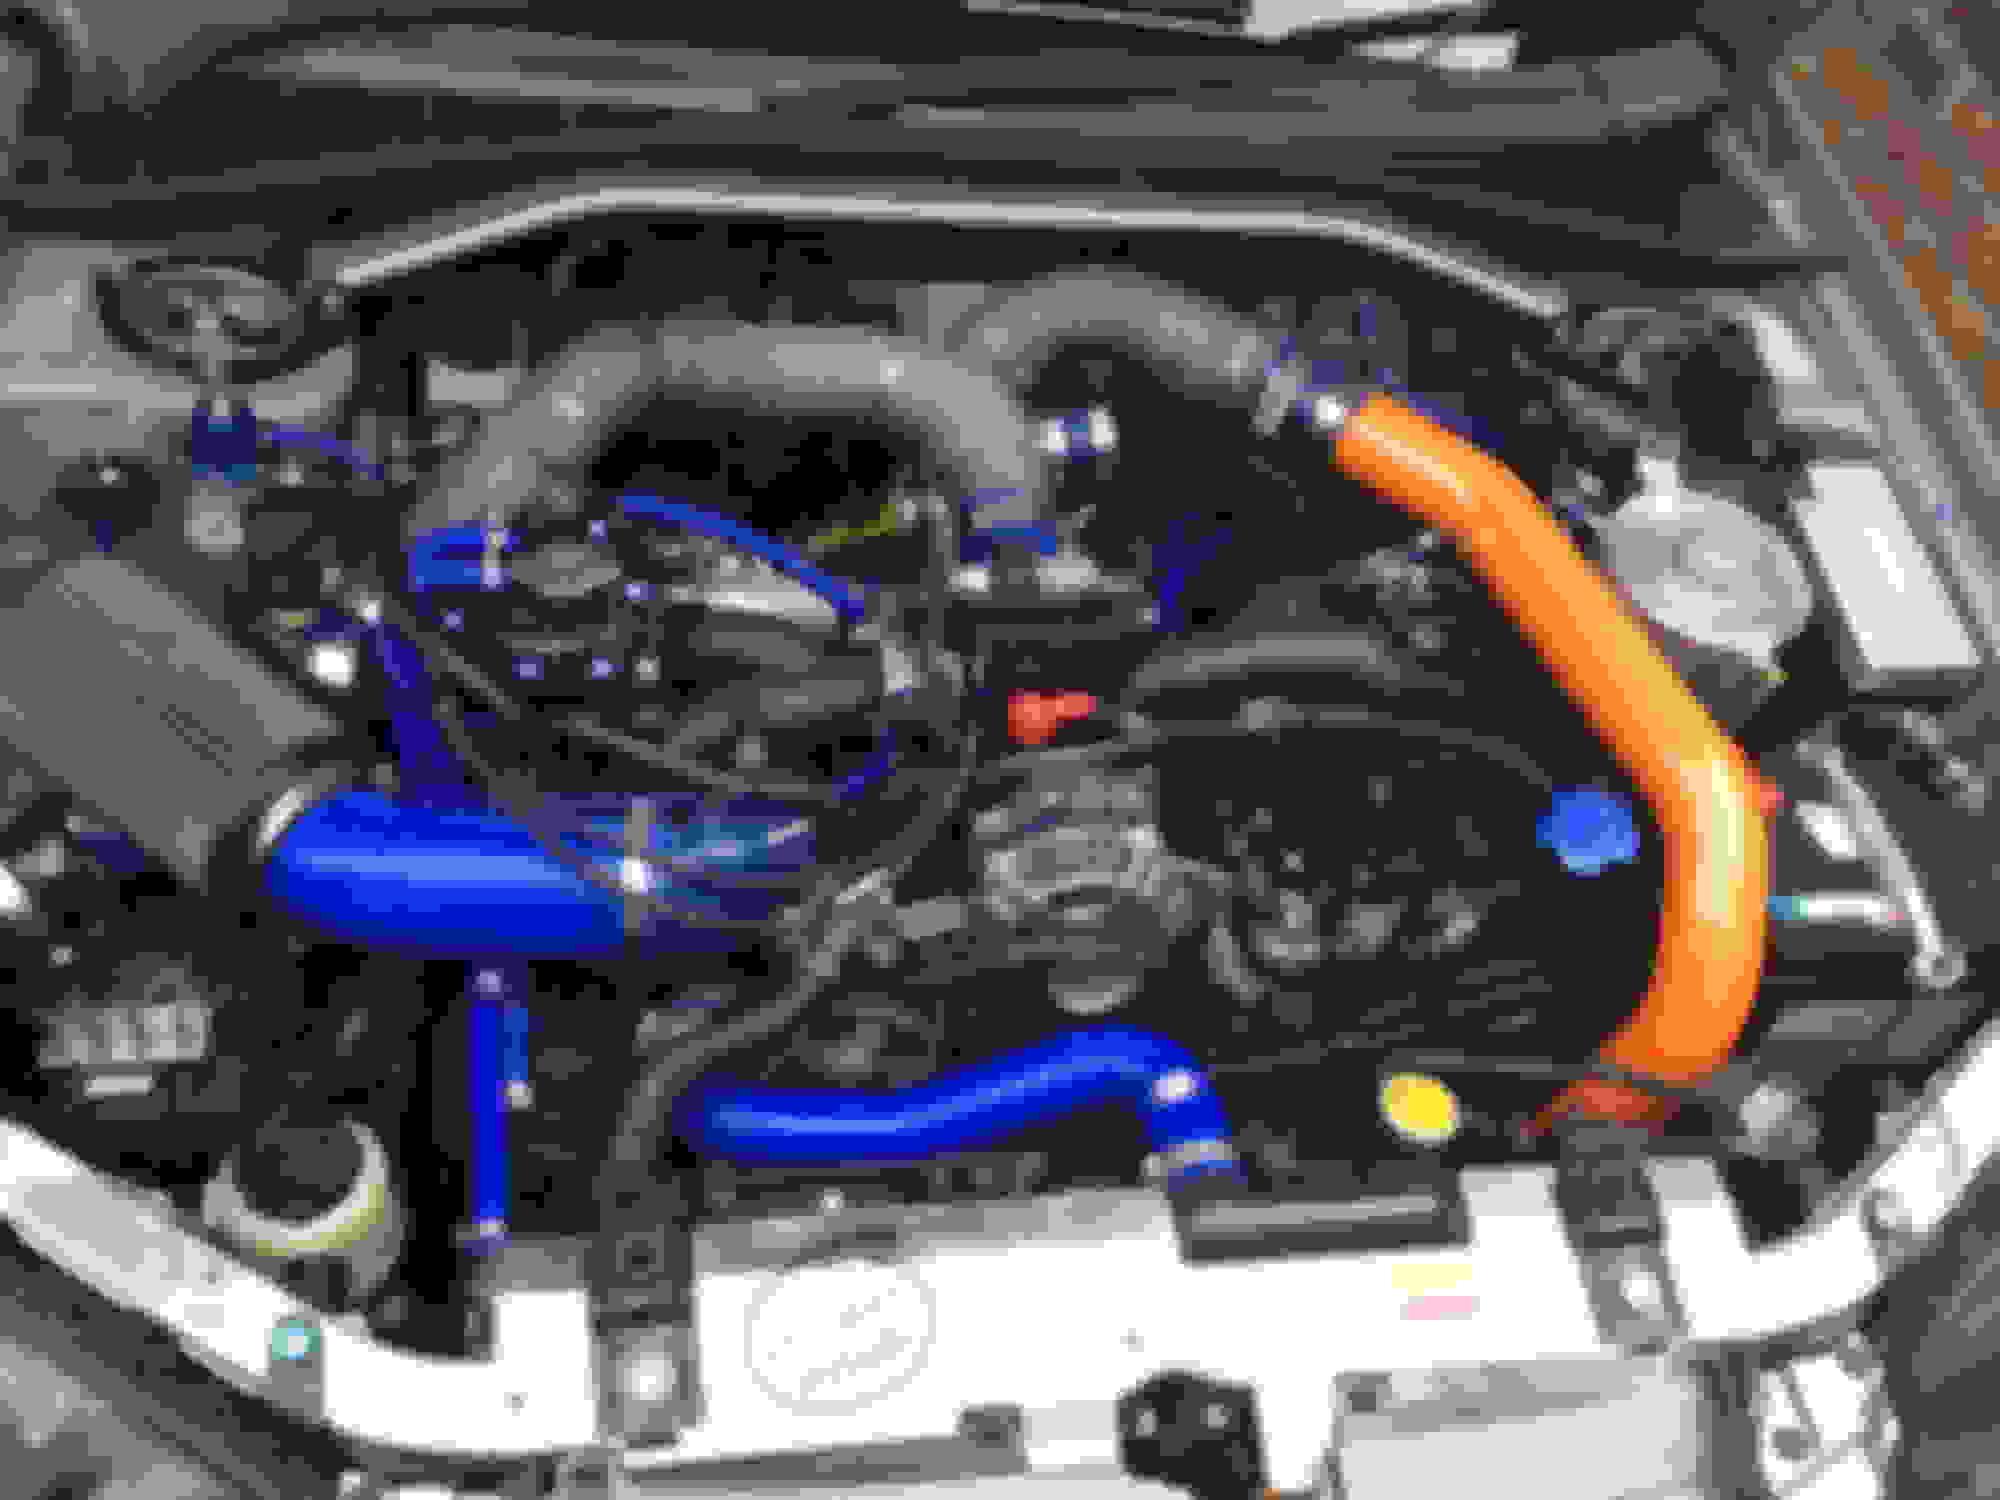 Clutch fork loose suddenly - how? - ScoobyNet com - Subaru